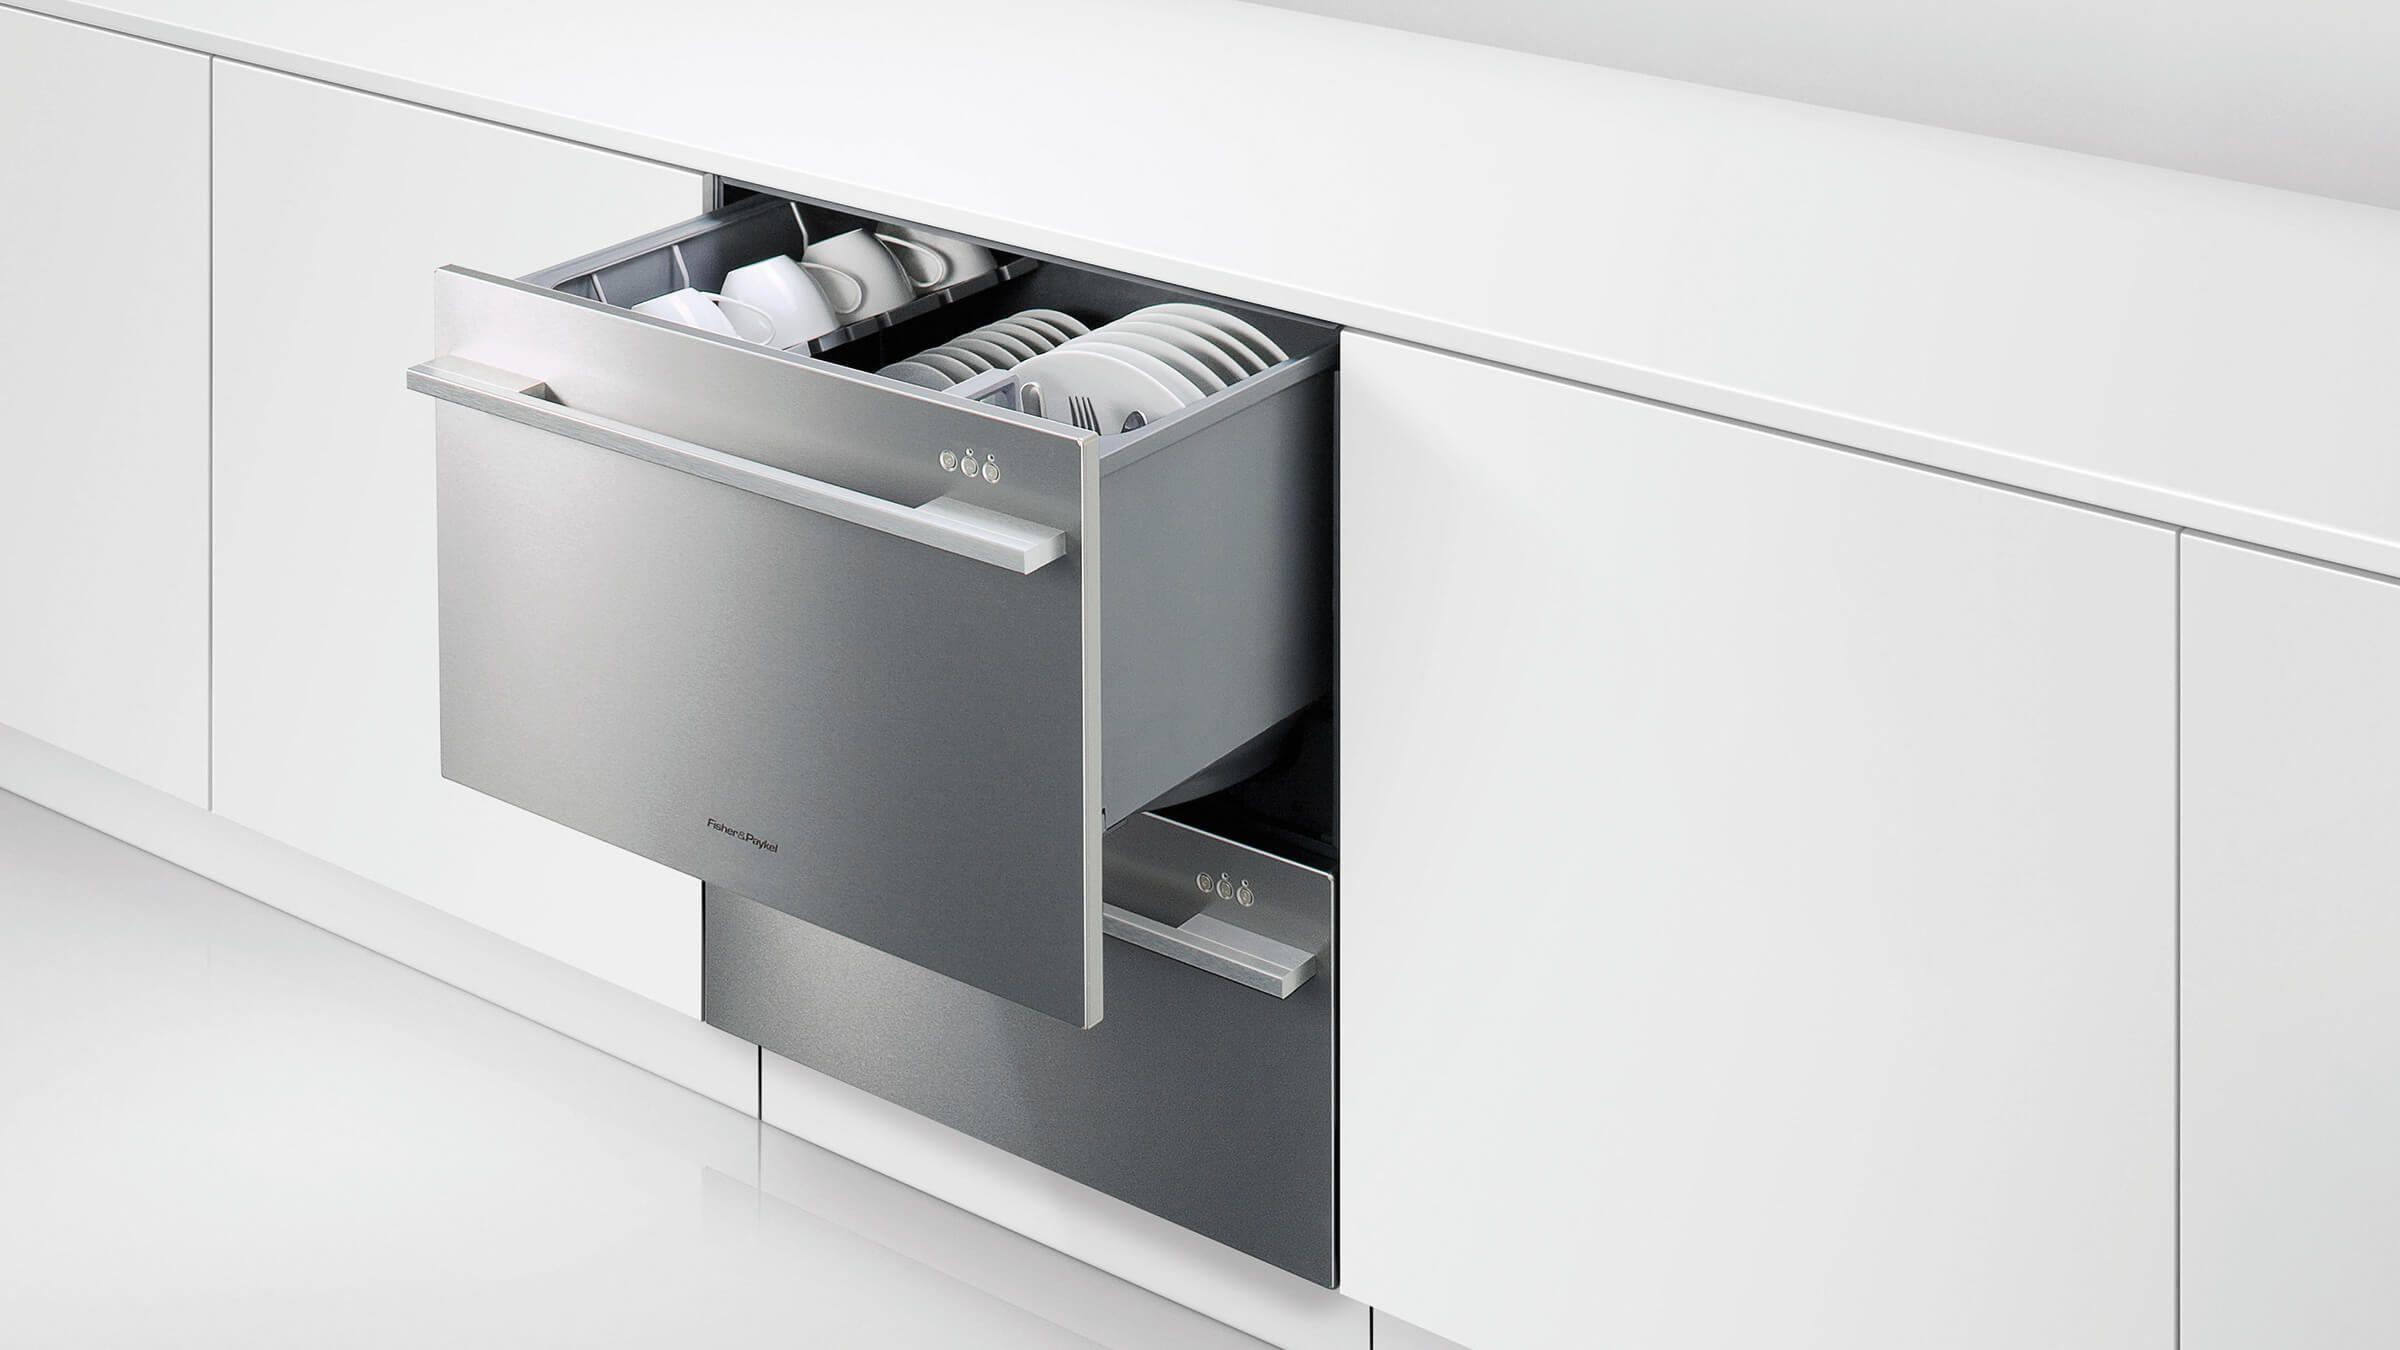 Fisher Paykel Dishwasher Drawers Vs Standard Dishwashers Review Drawer Dishwasher Double Drawer Dishwasher Fisher Paykel Dishwasher